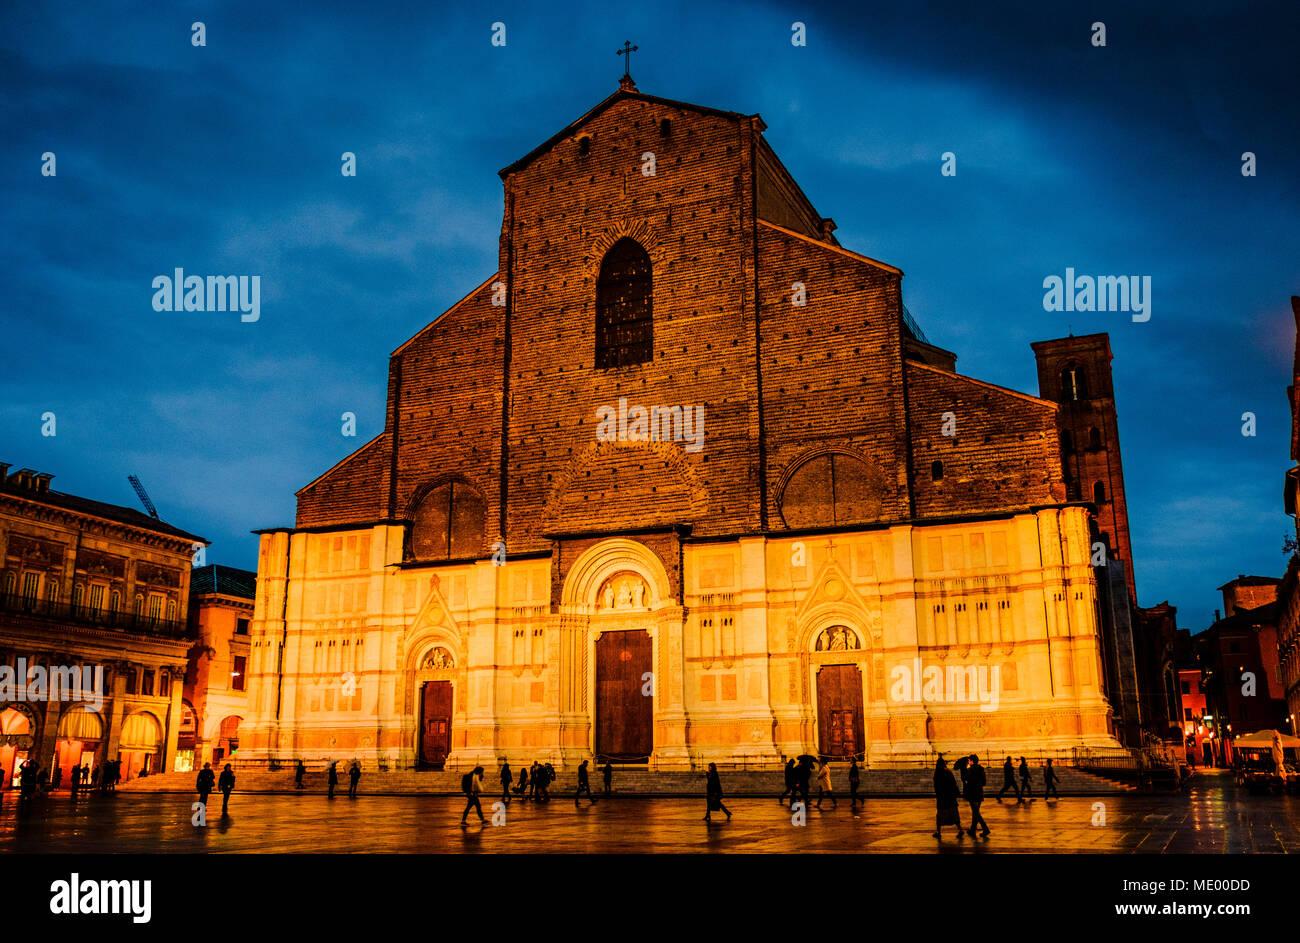 The Basilica di San Petronio floodlit on a wet rainy evening, Bologna, Italy - Stock Image